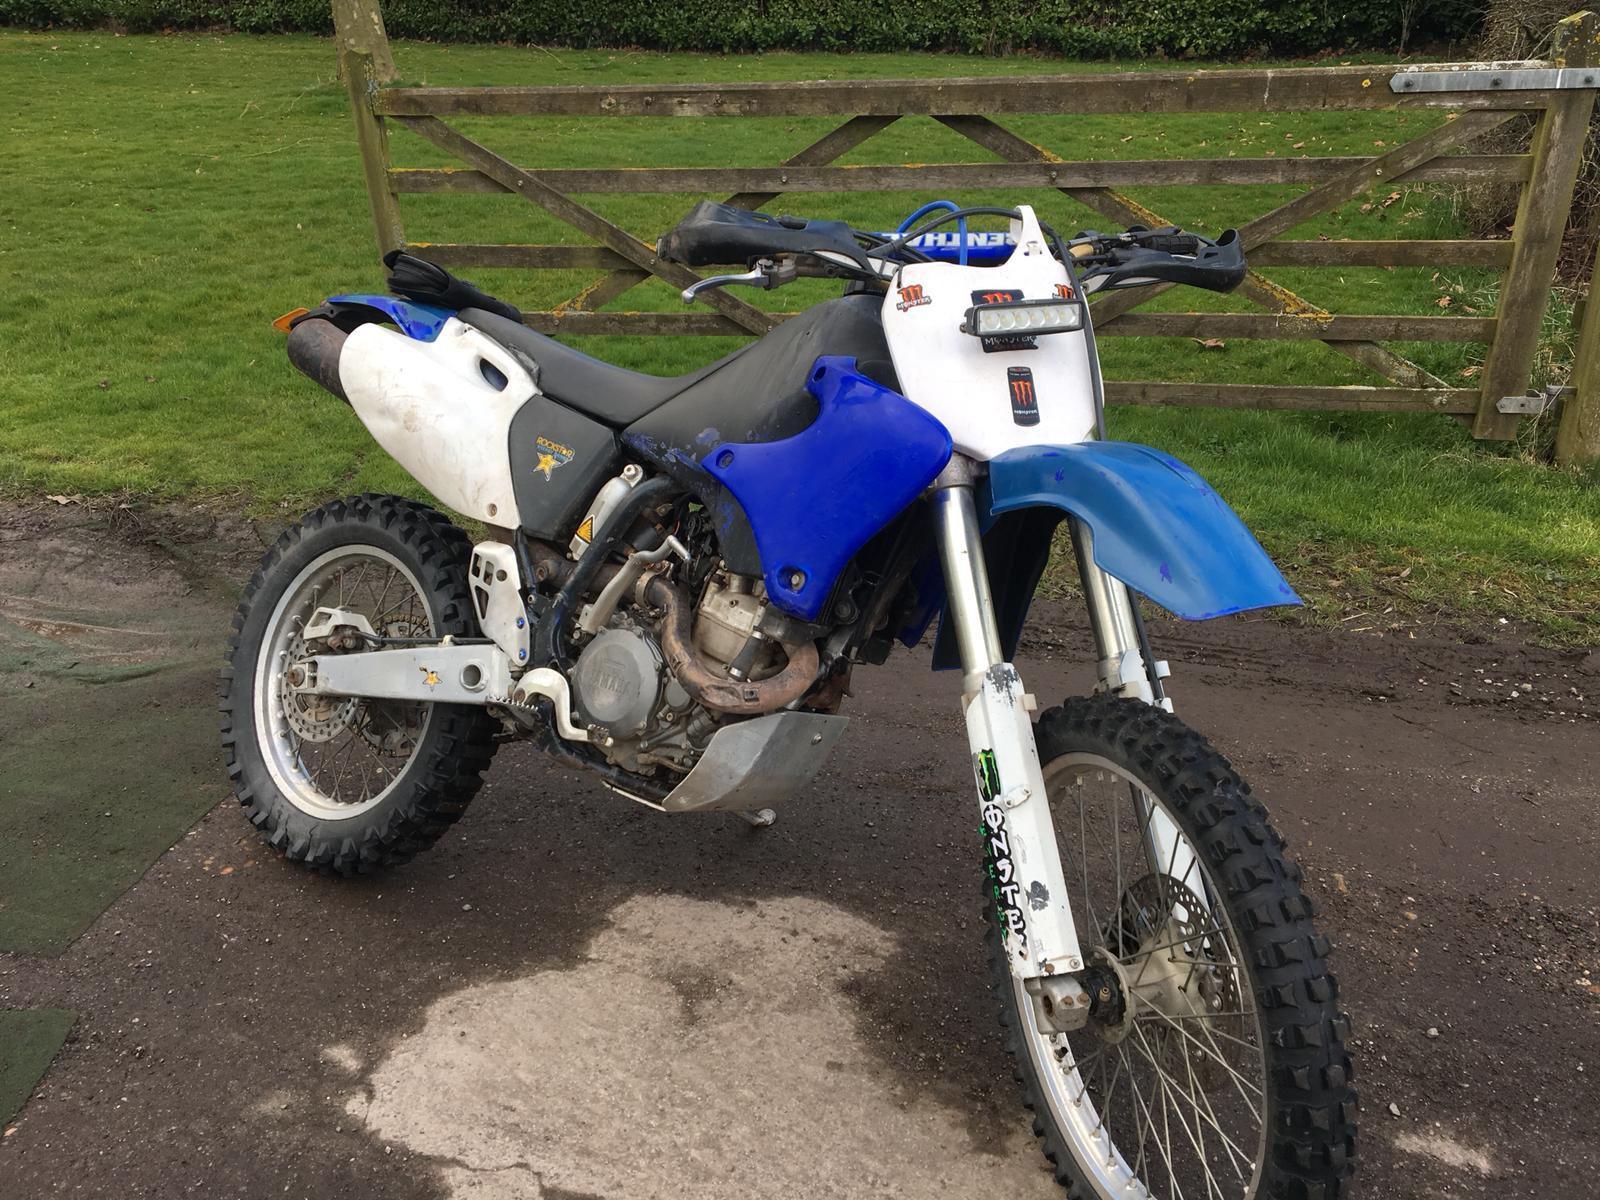 Kb 1998 r reg yamaha 400cc blue petrol motorcycle for Yamaha 400cc motorcycle